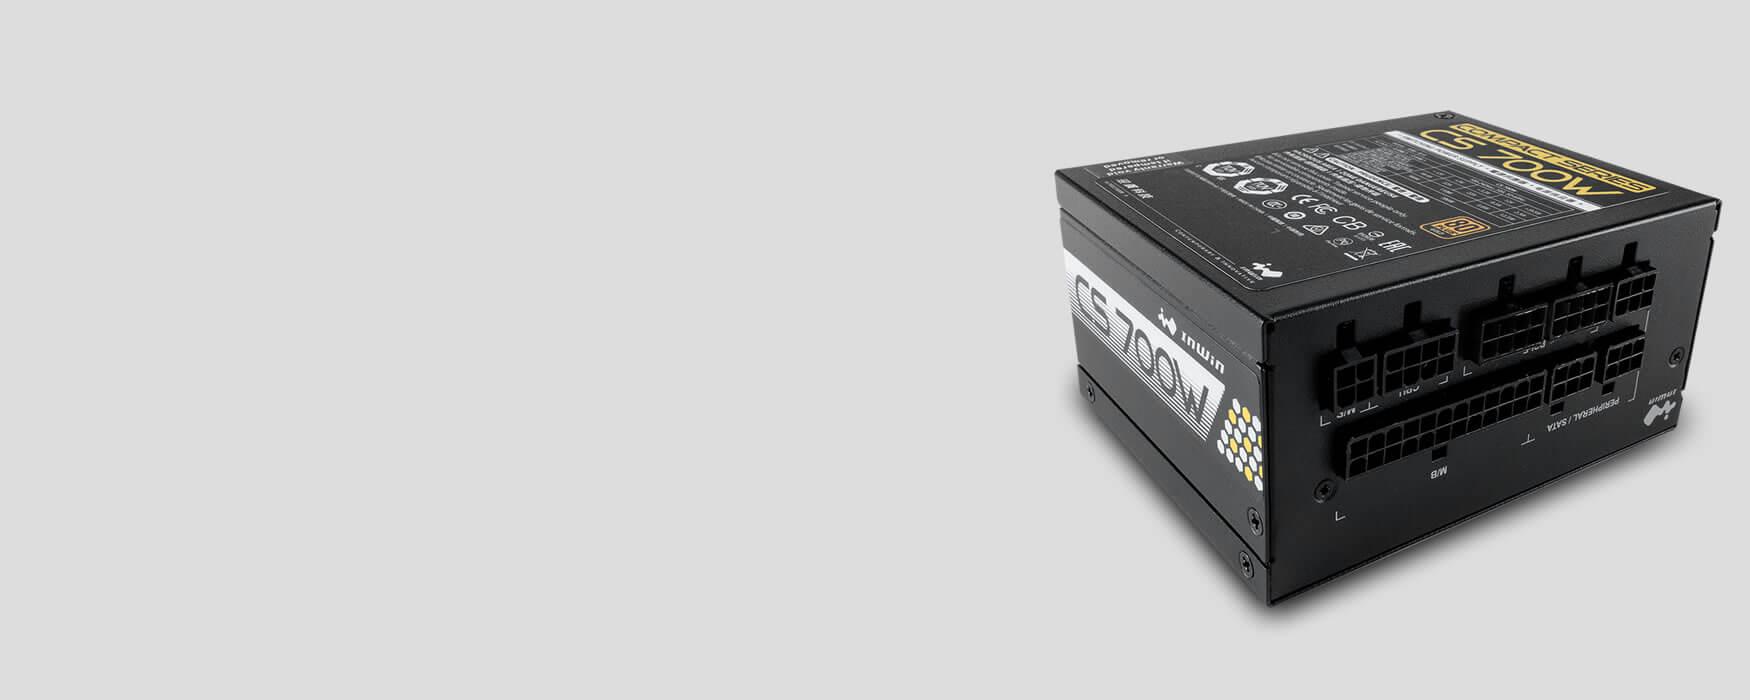 Inwin Gaming Power Supply Antec Atx12v Tester Cs 700w